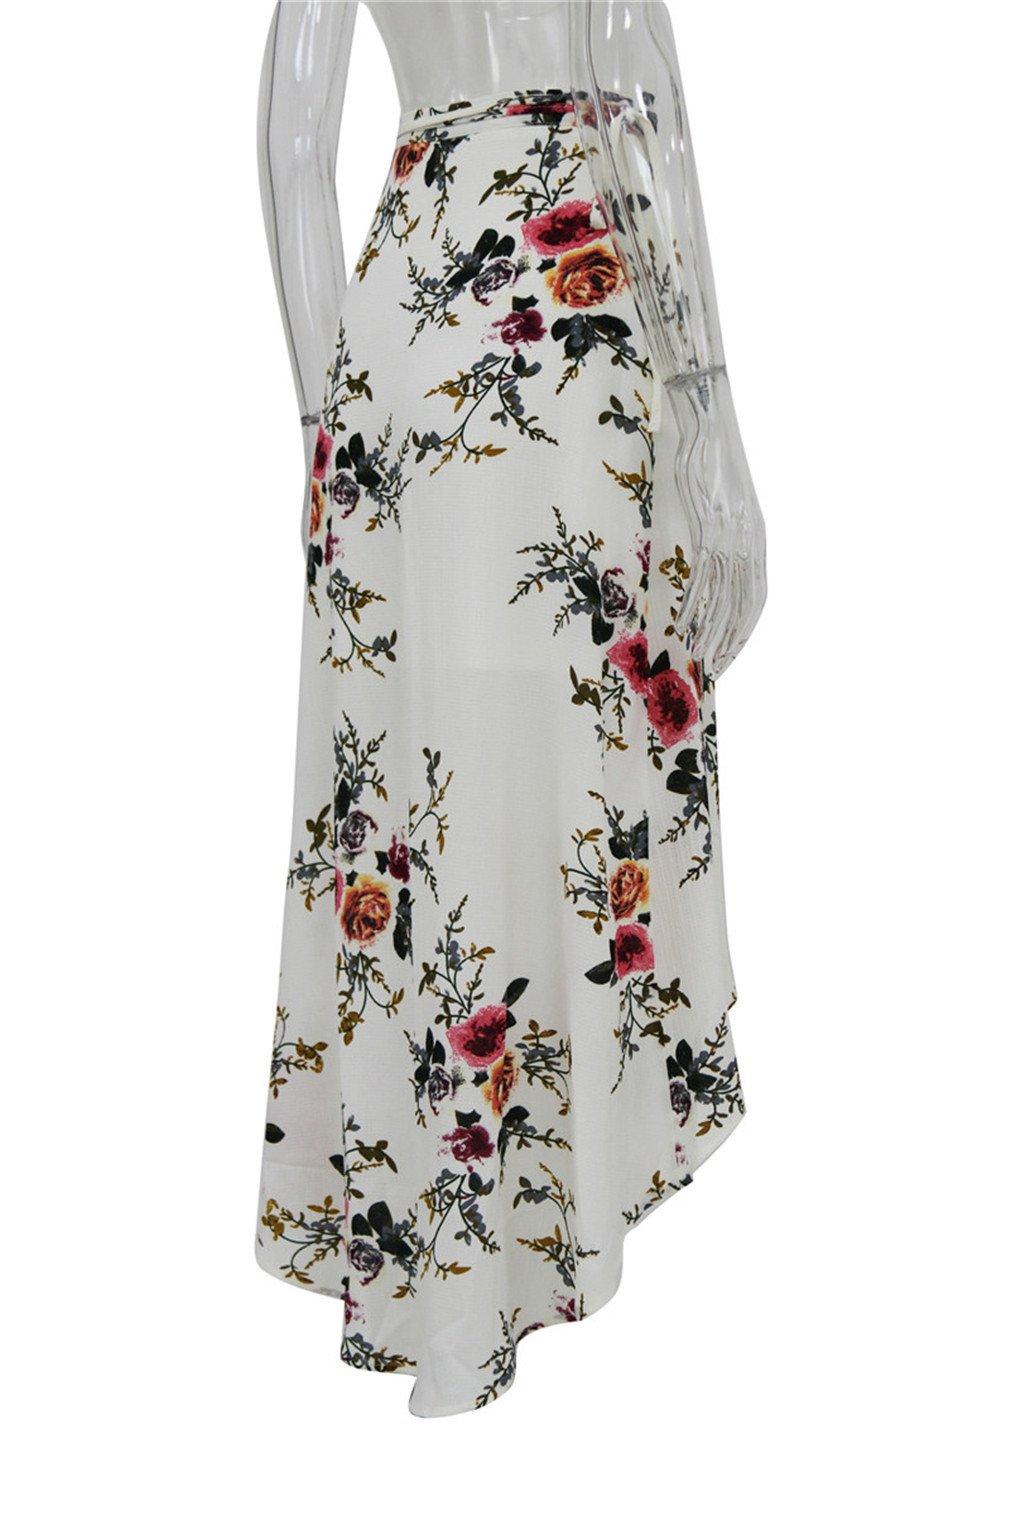 Beachfavora Summer Boho Vintage Floral Print Side Slit Wrap Maxi Skirt Girl Waist Skirts White XL